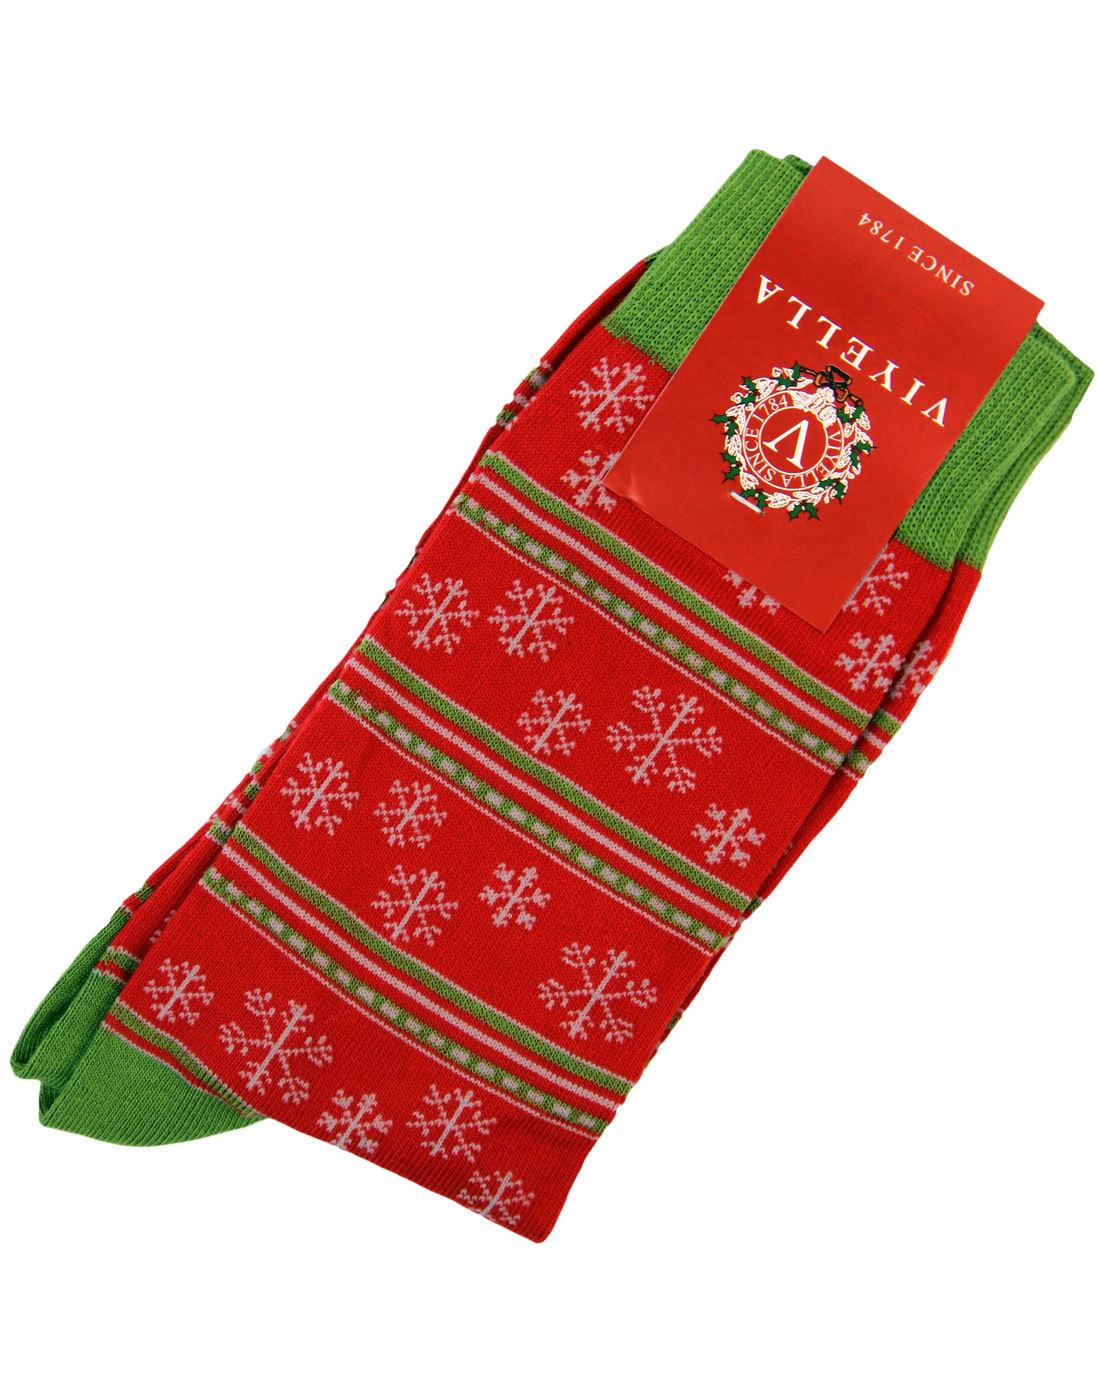 + Snowflake Fairisle VIYELLA Retro Christmas Socks